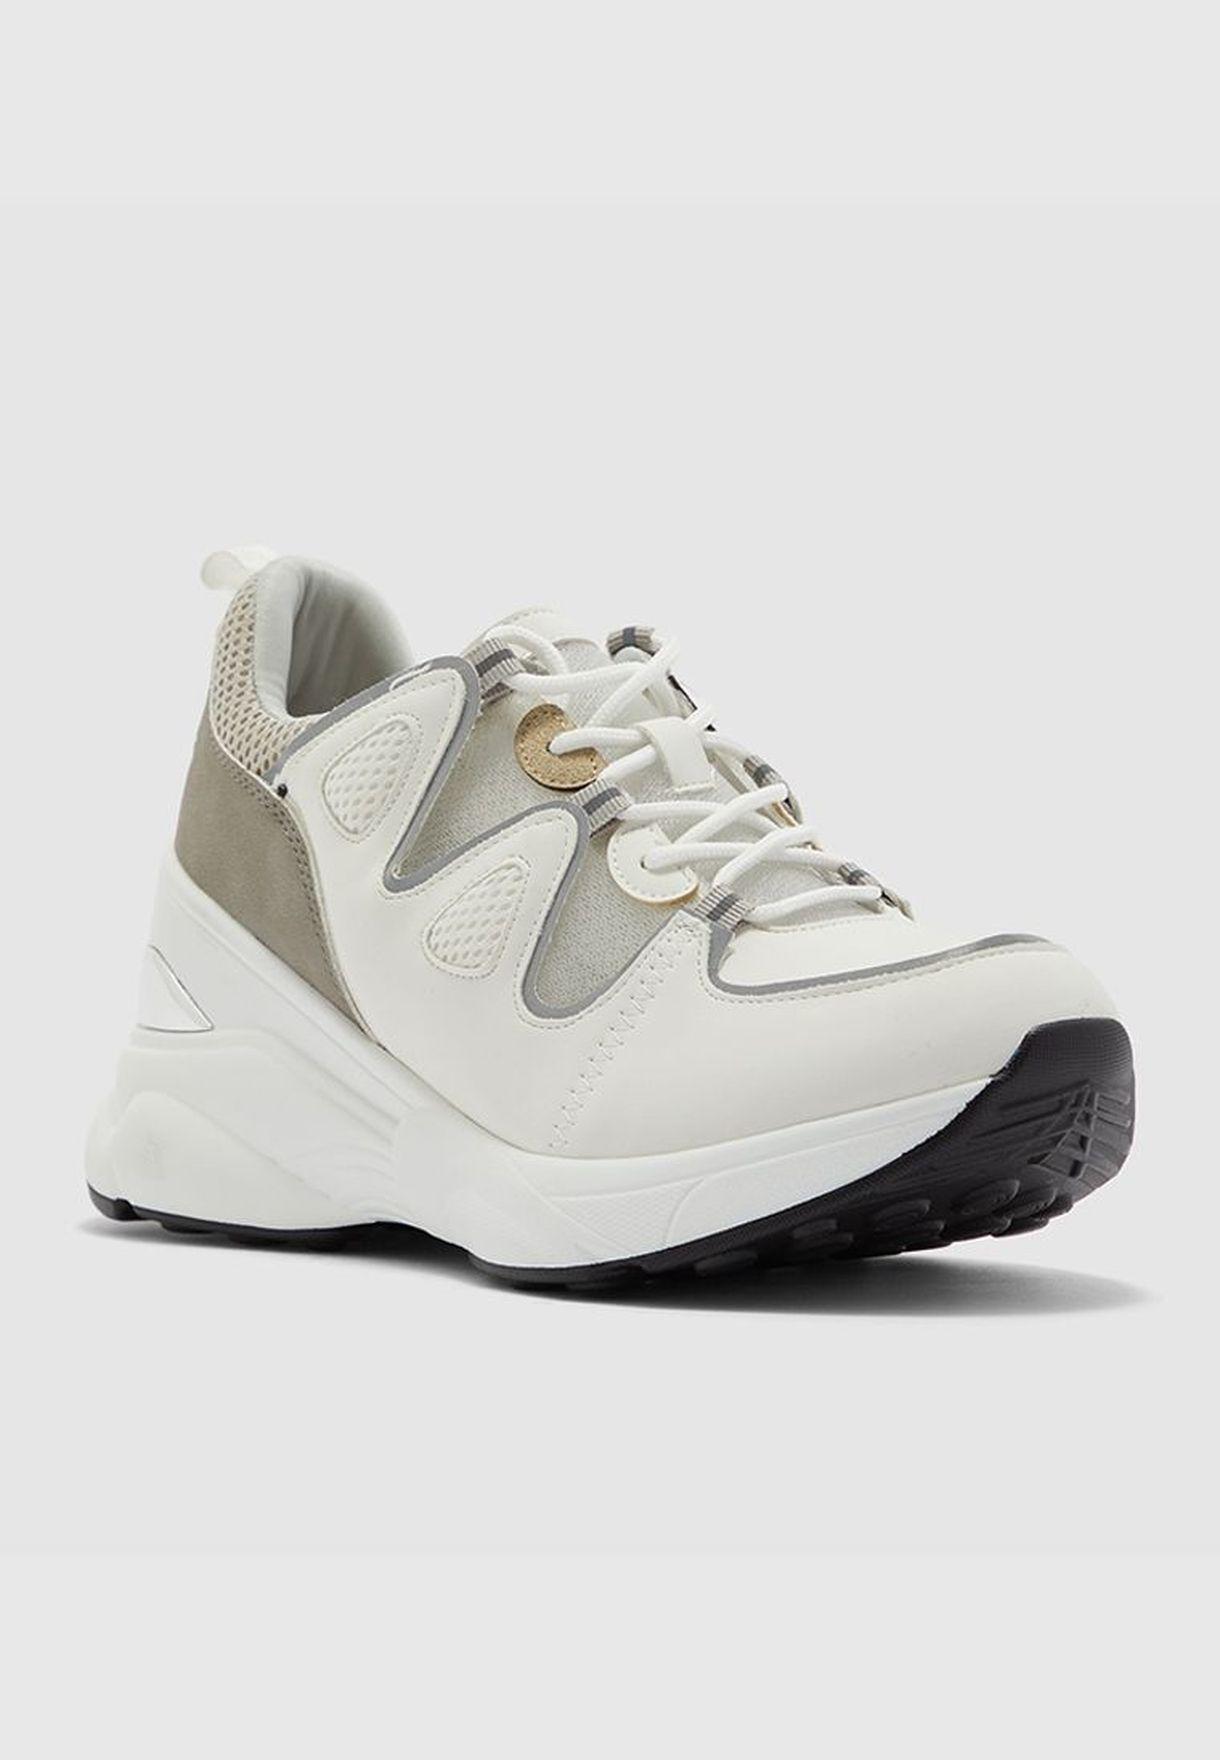 Brooklynn Comfort shoes